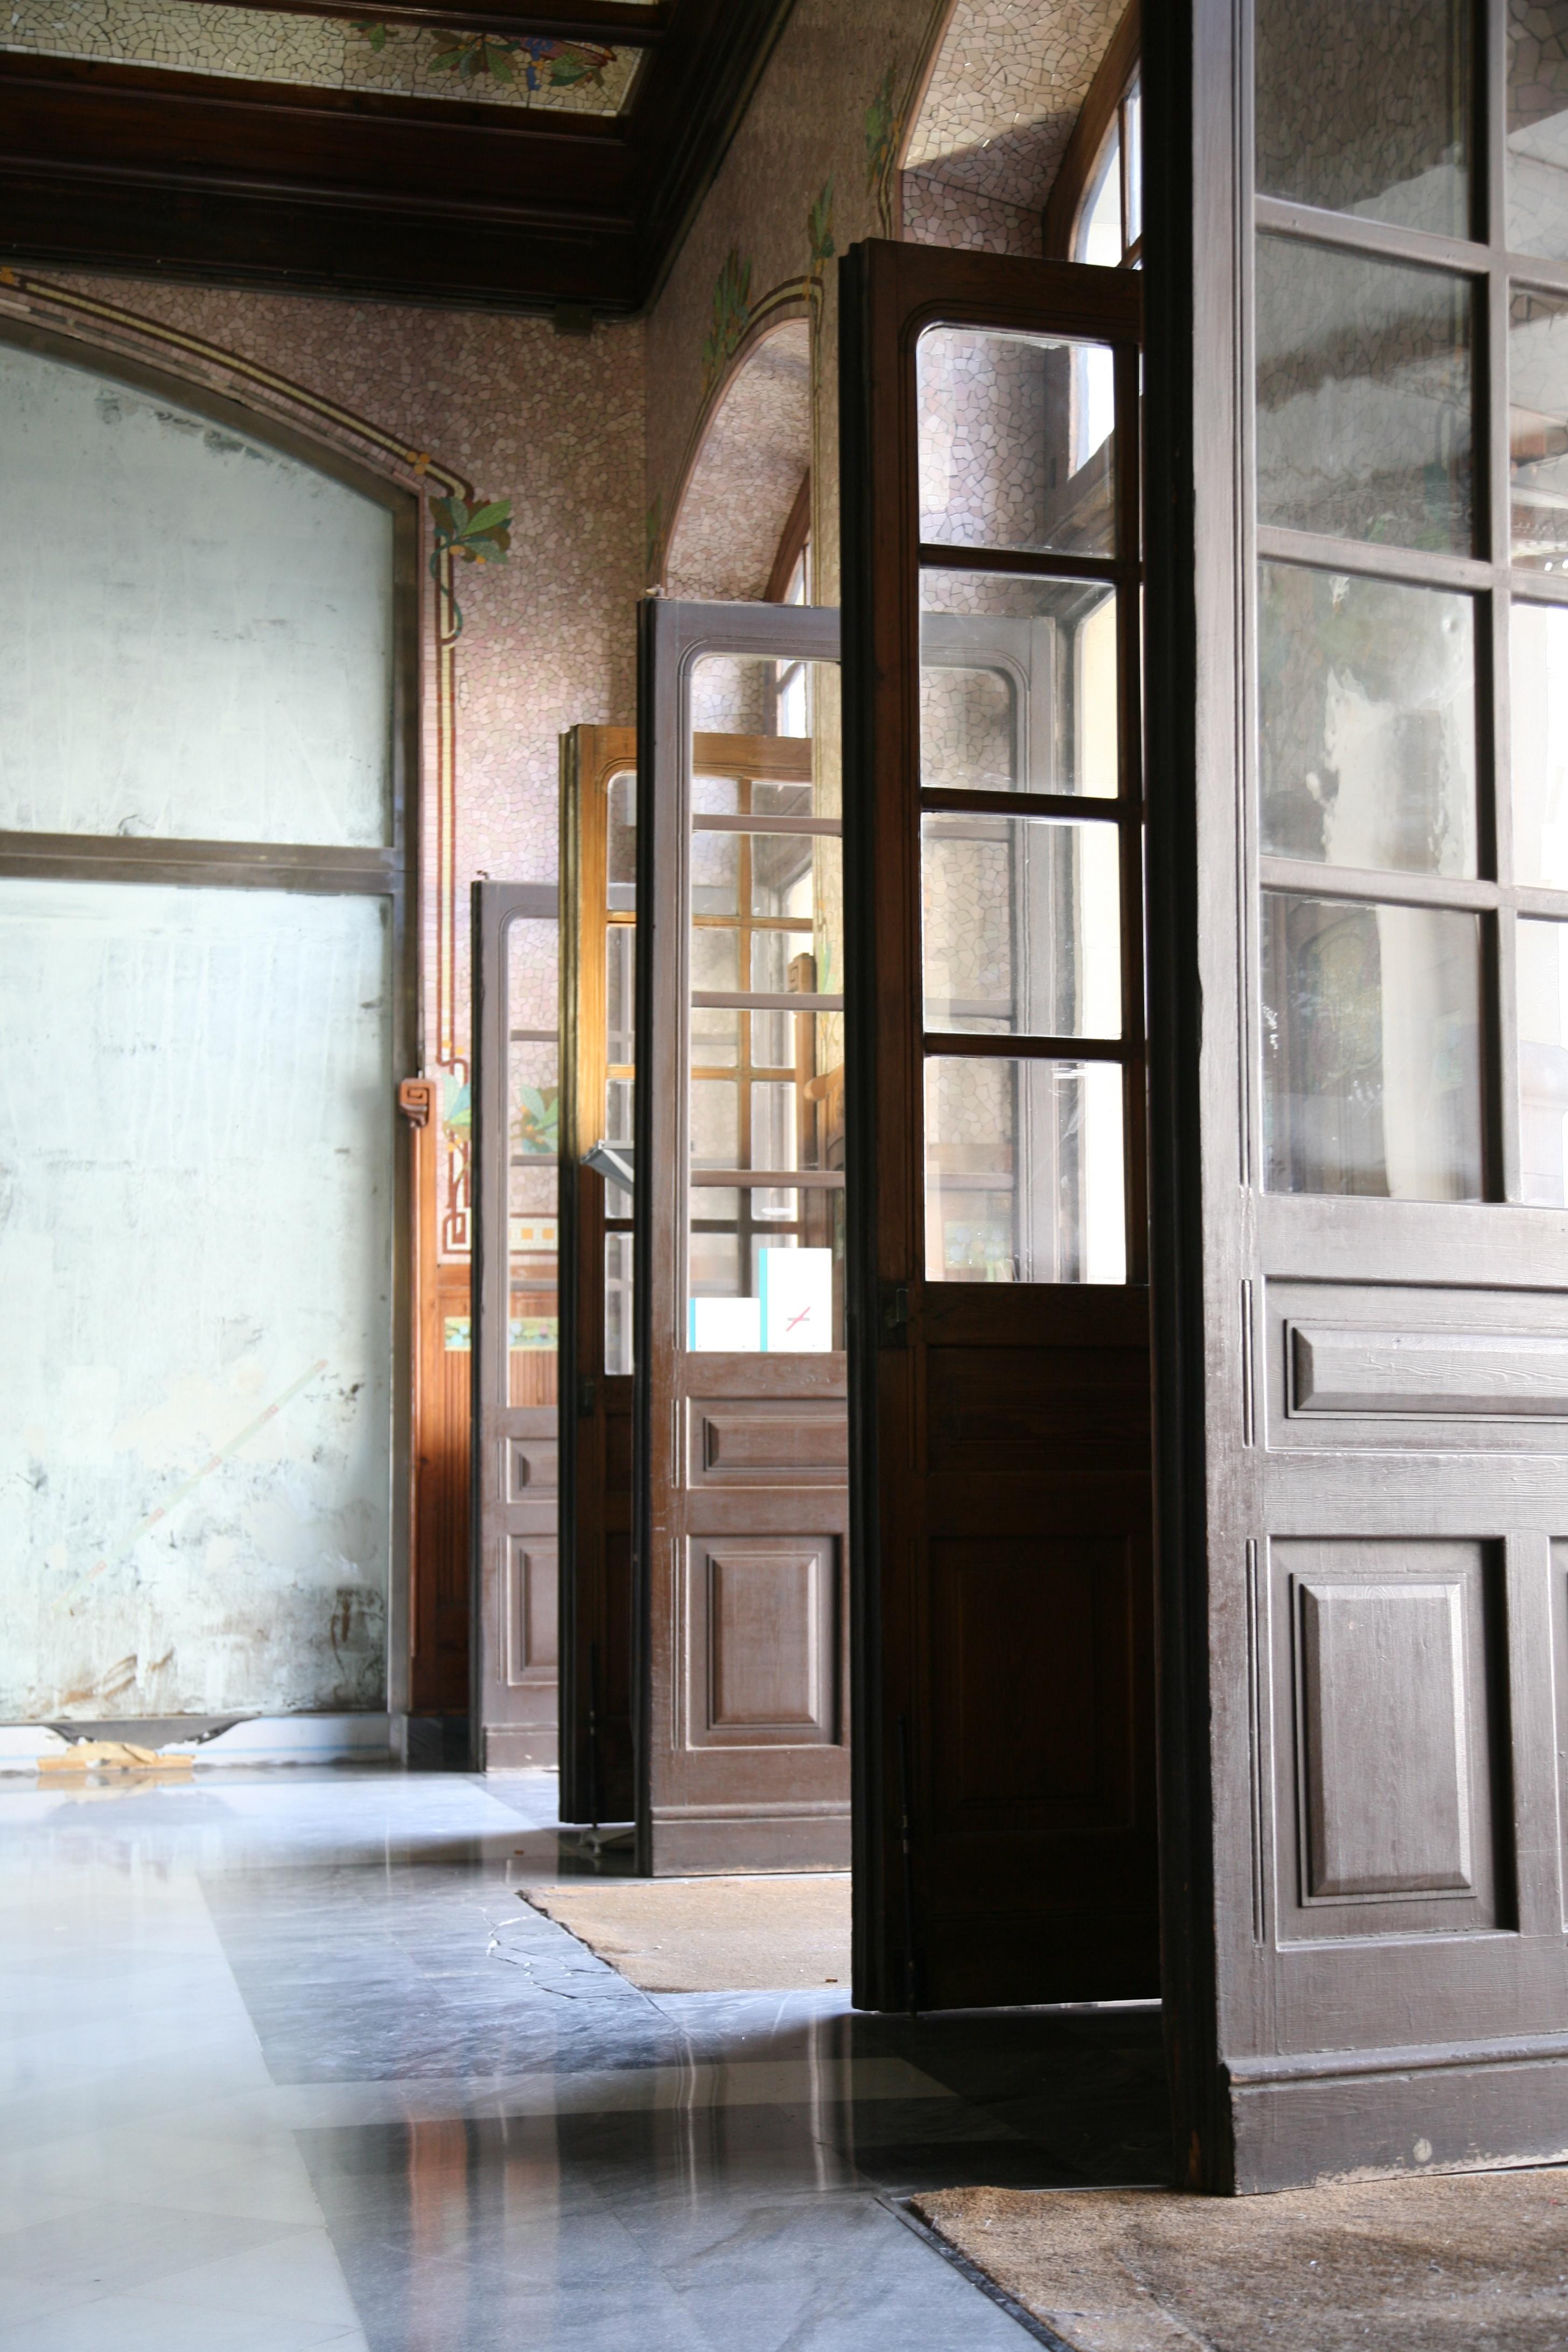 Fotos gratis : arquitectura, madera, piso, casa, sala, fachada ...